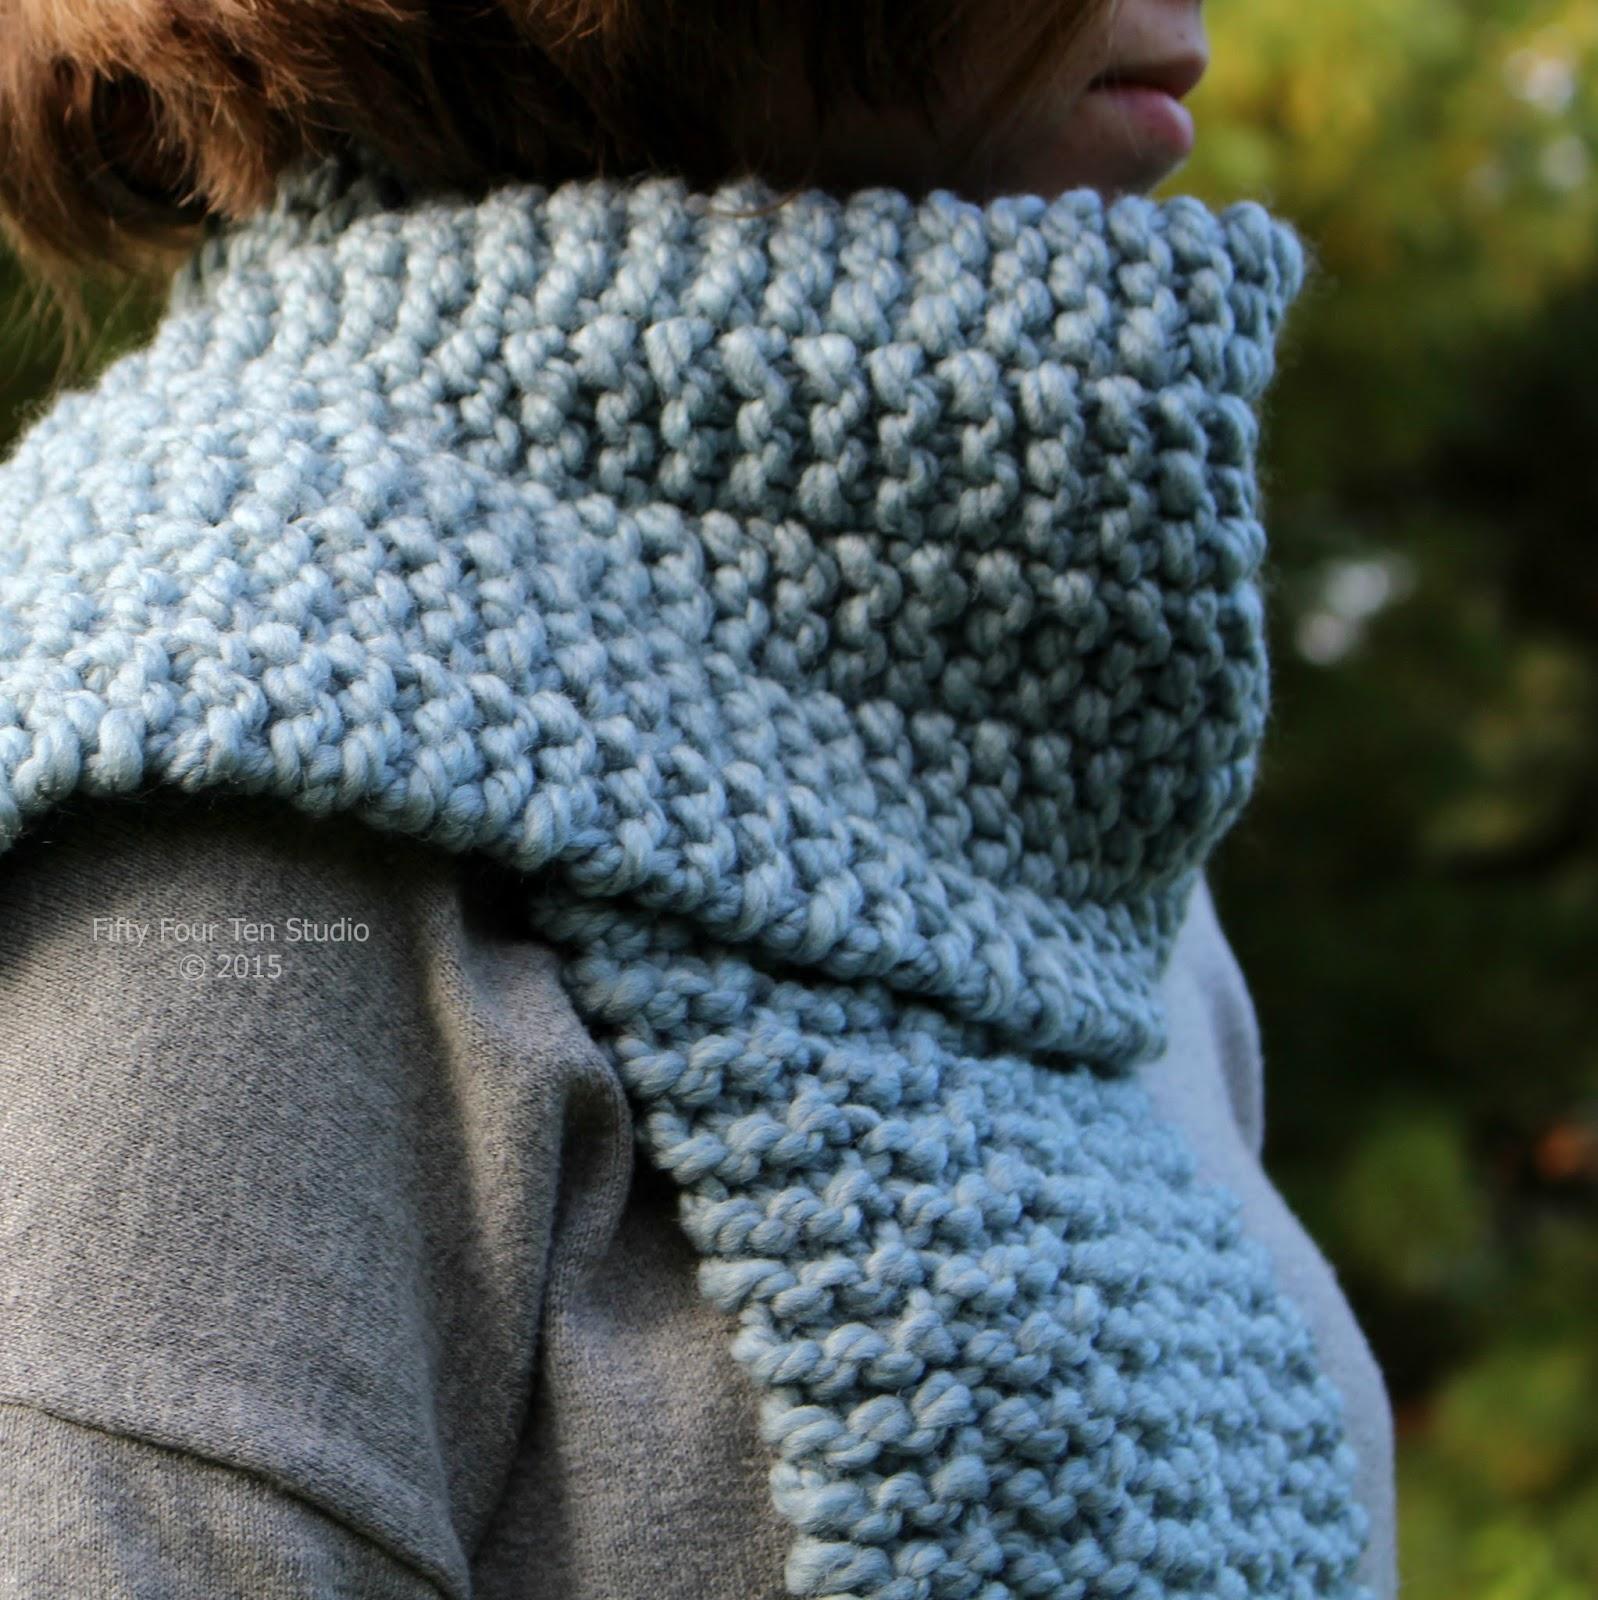 Fifty Four Ten Studio: New Easy Scarf Knitting Pattern - Side Line Scarf